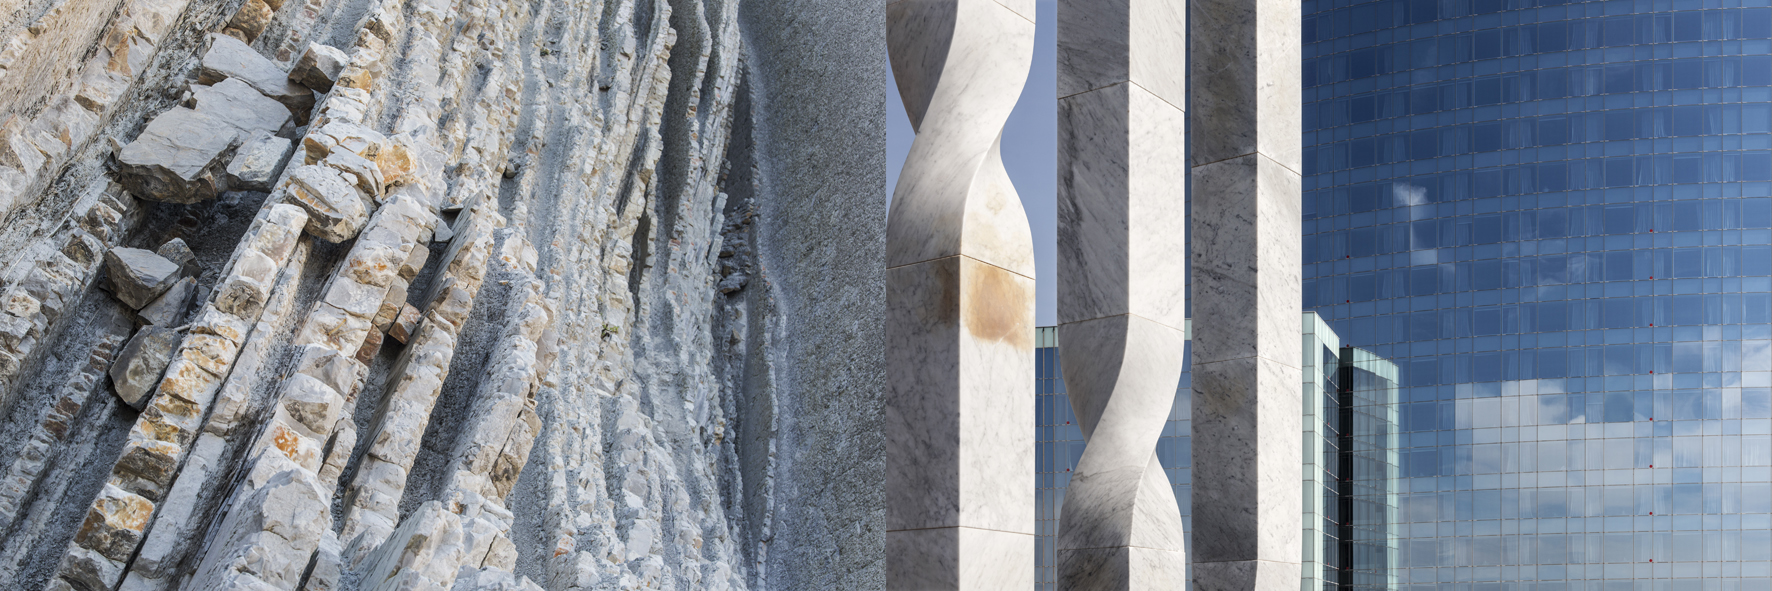 Metamorfósis - Como dos gotas de poesía   - Como dos gotas de poesía, fotografías de LaraBisbe